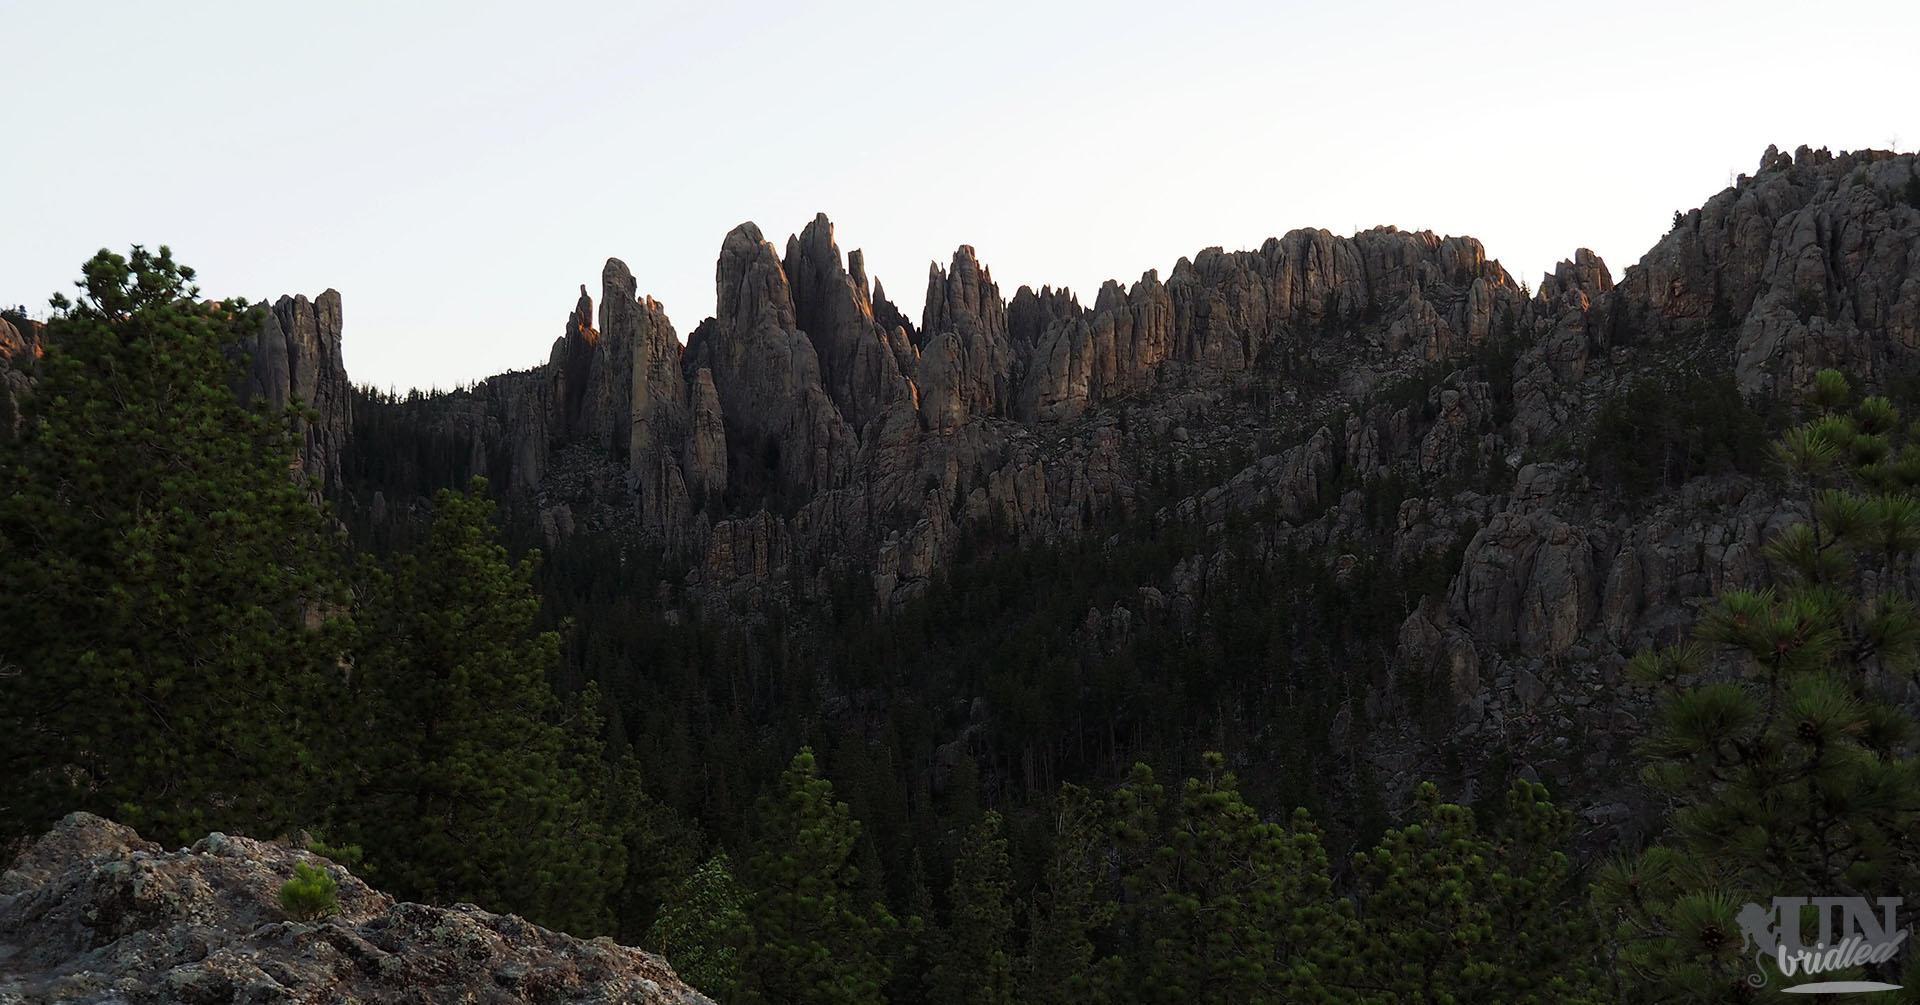 Berge im Custer State Park